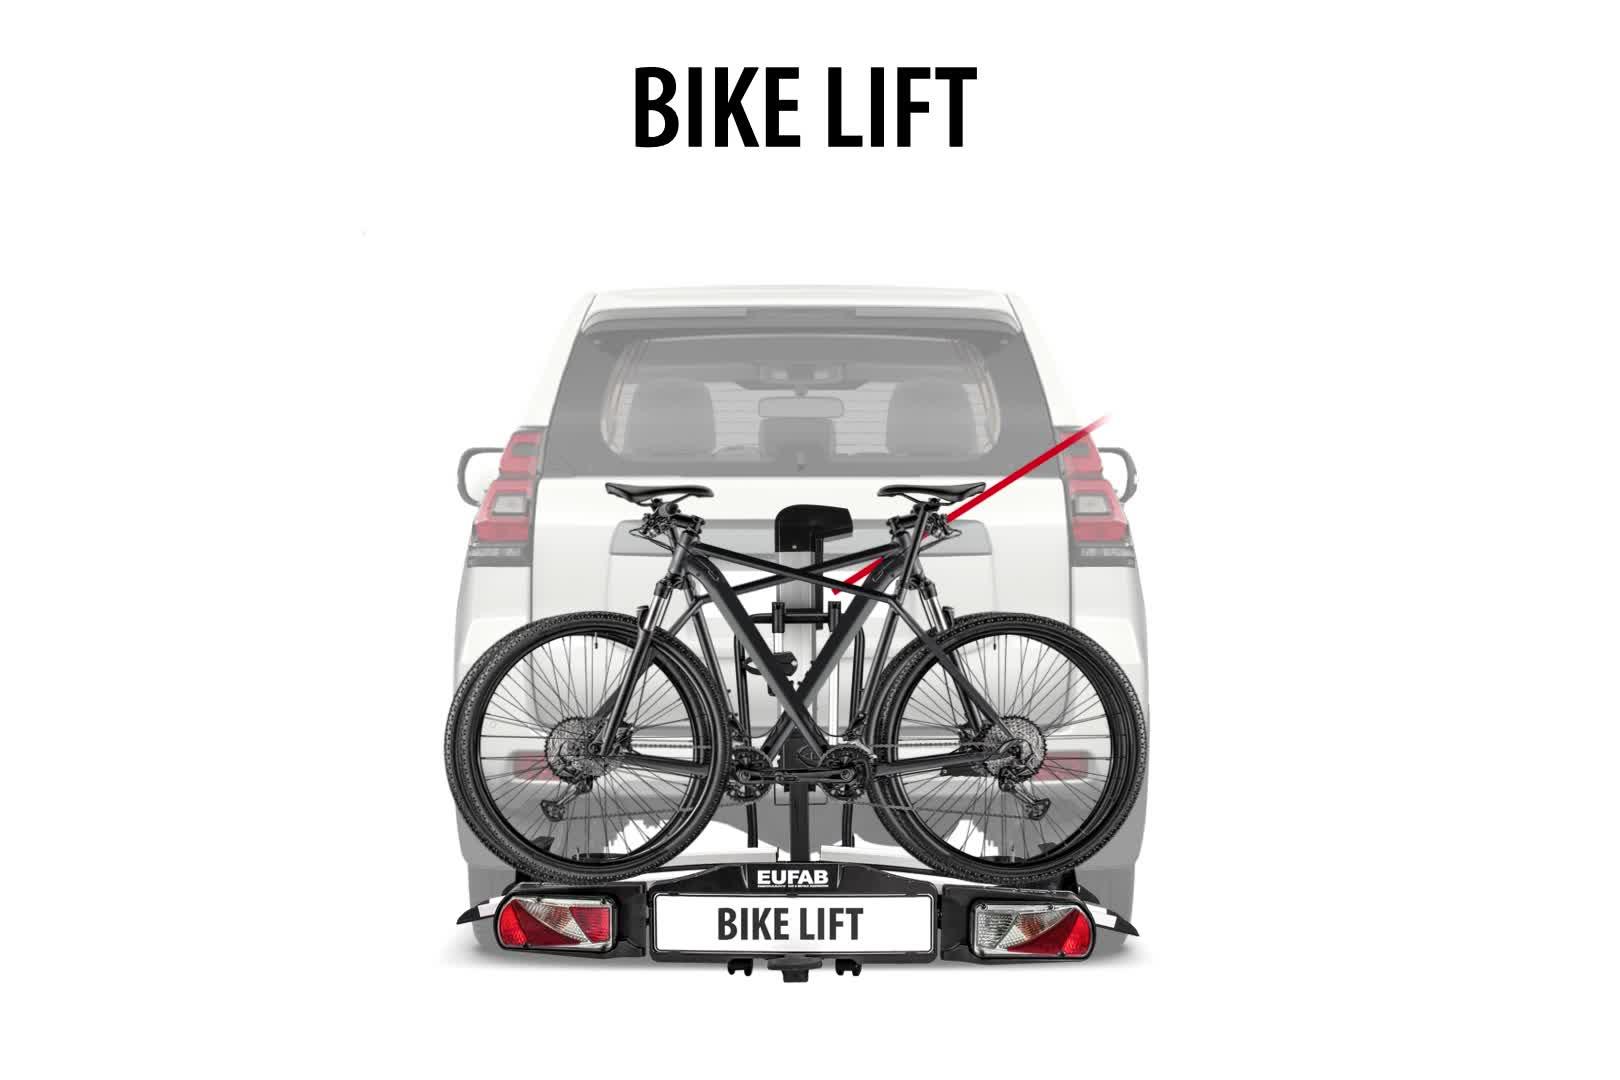 6169GW5lcGL EUFAB 11535 Heckträger Bike Lift, für E-Bikes geeignet